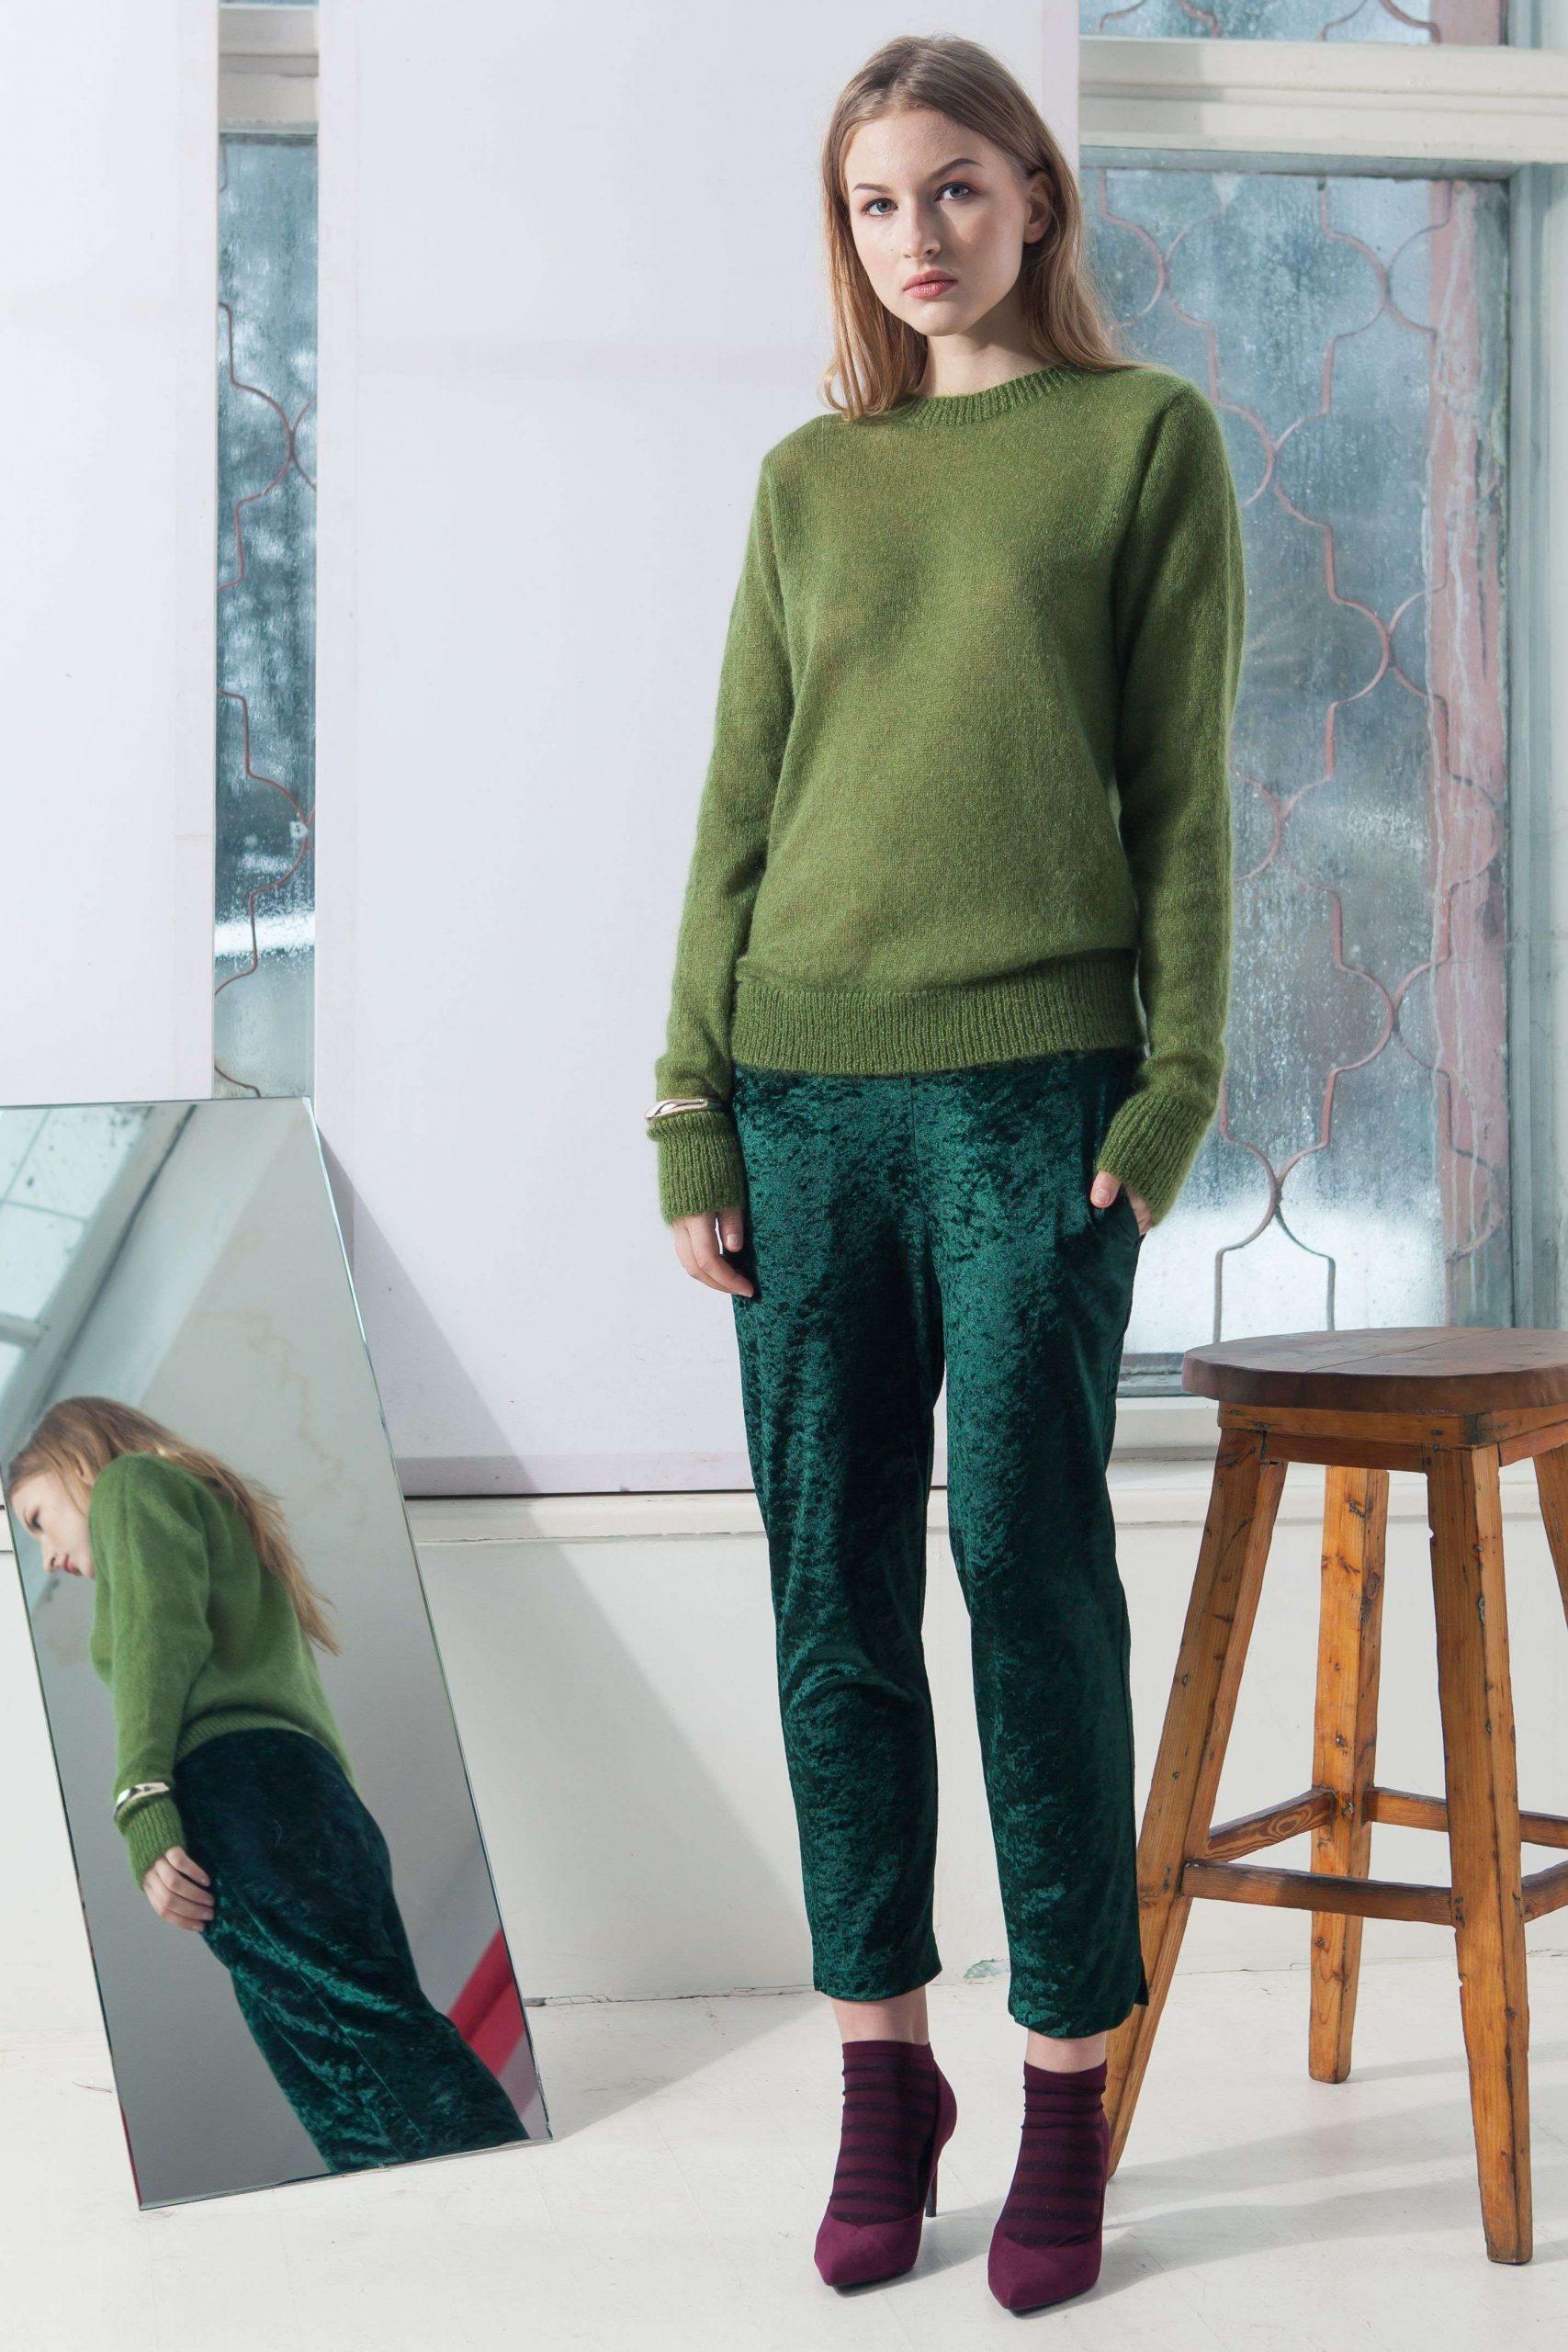 damen pullover green mohair crew neck sweater adele green krista elsta  green mohair crew neck sweater adele